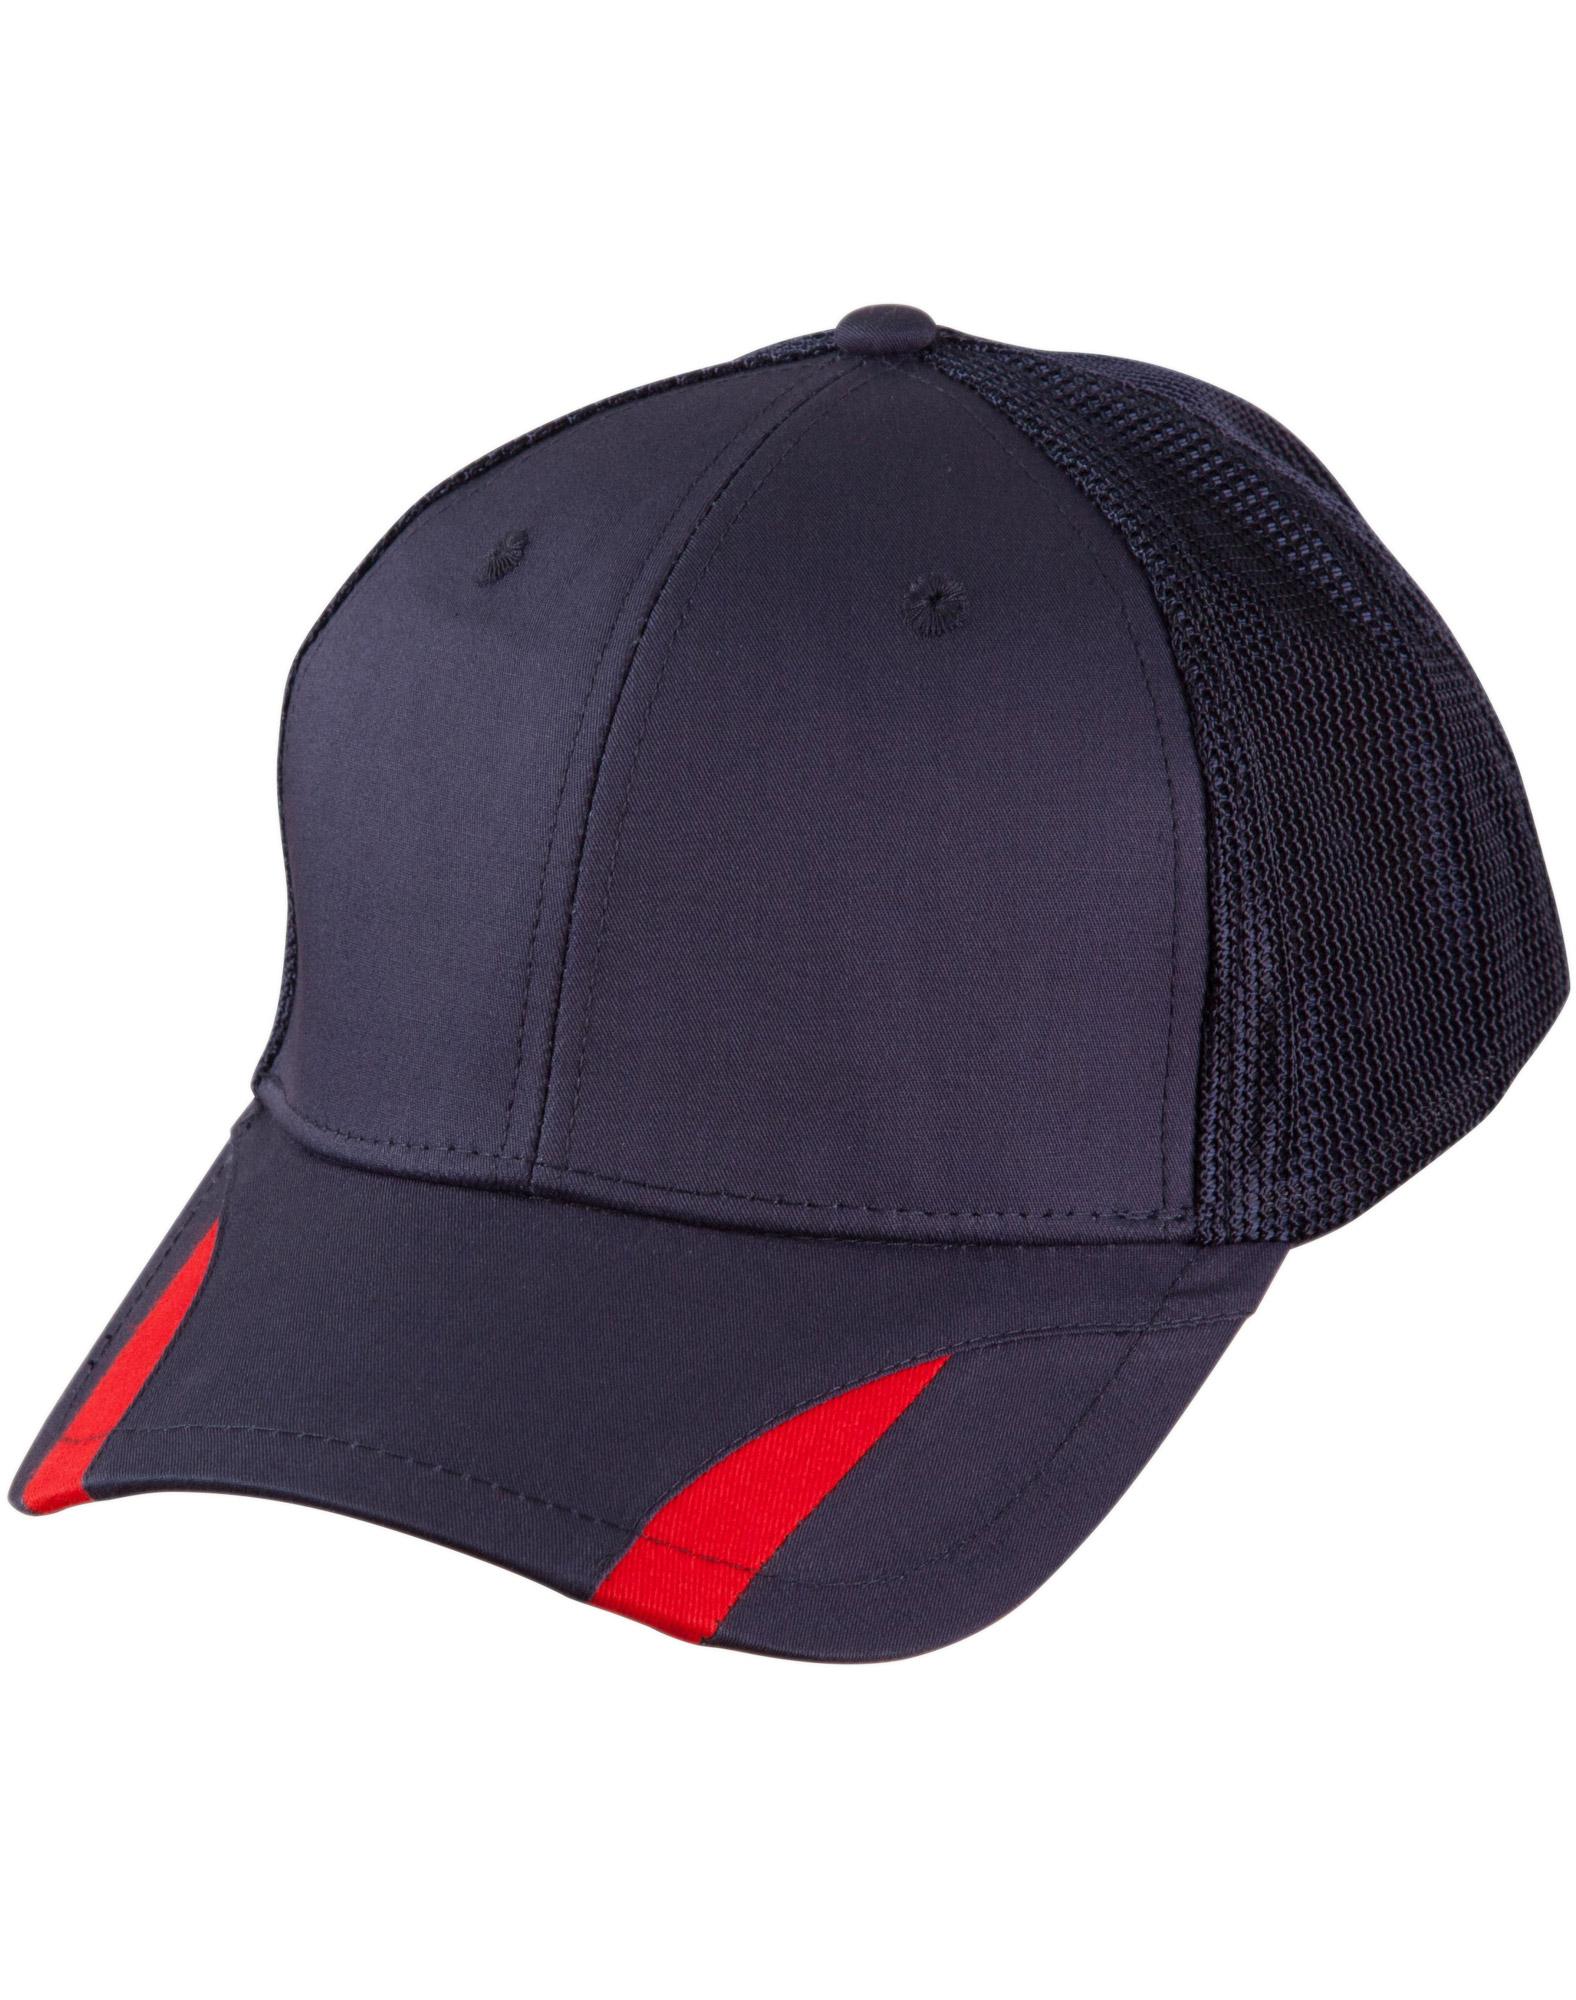 Navy.Red